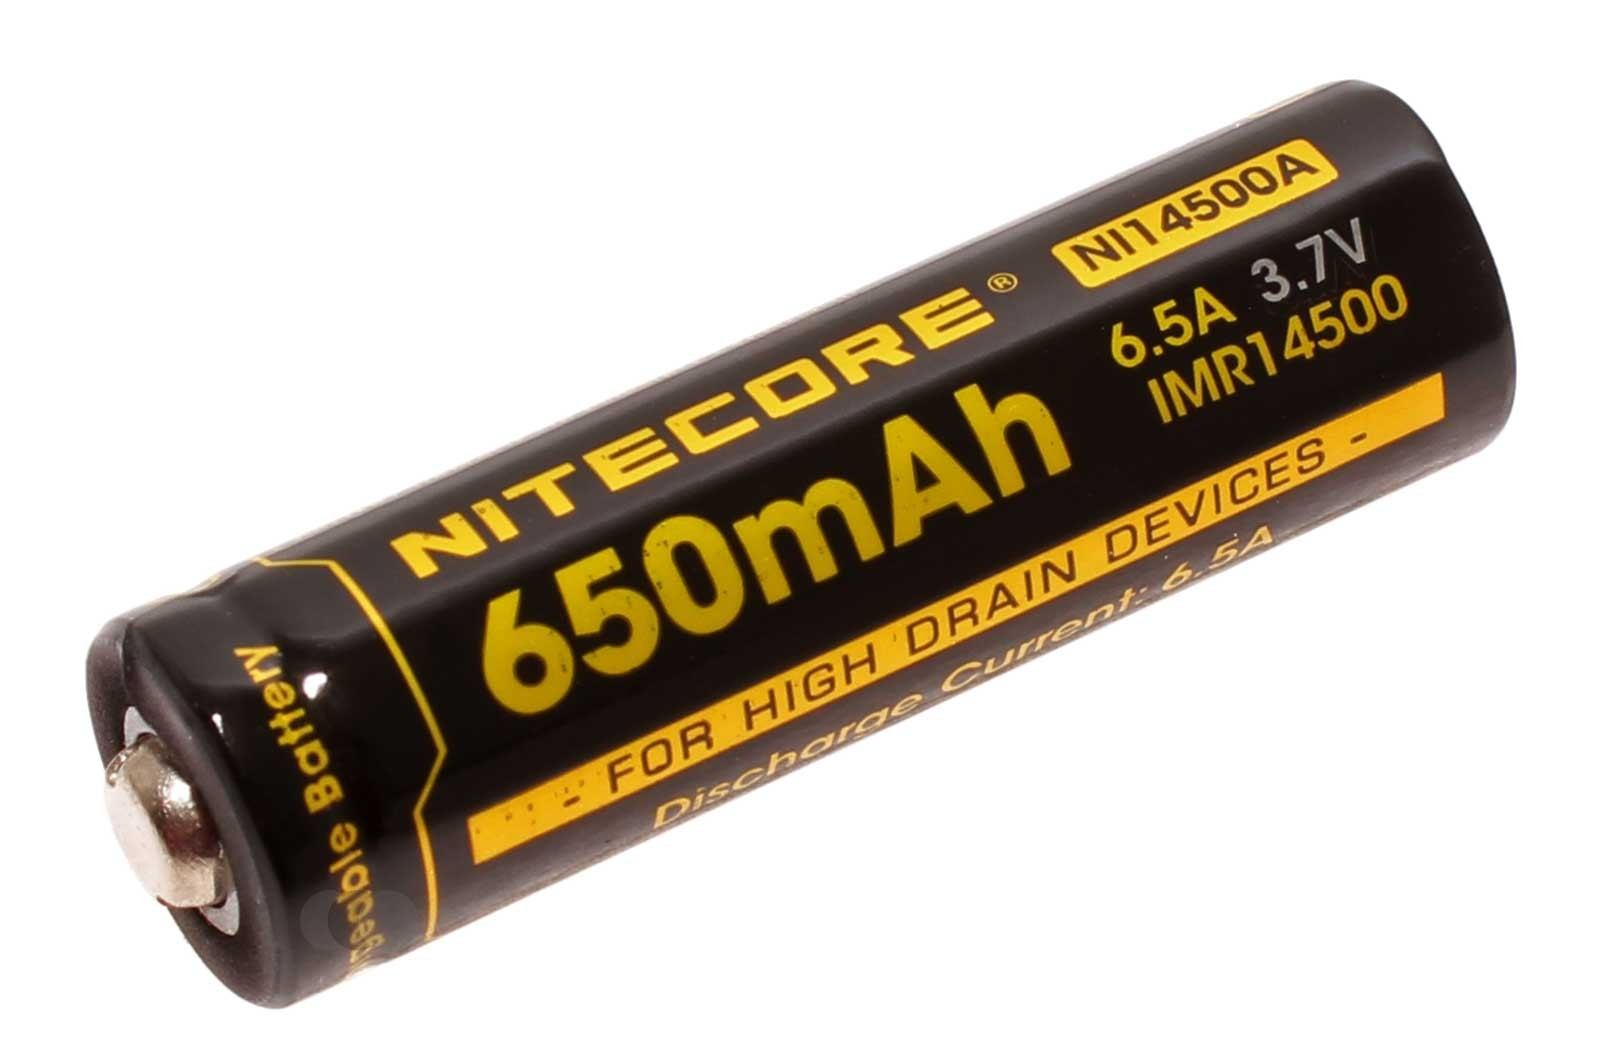 Nitecore IMR14500 Li-Ion Akku ungeschützt mit 3,7 Volt und 650mAh Kapazität, Modell NI14500A